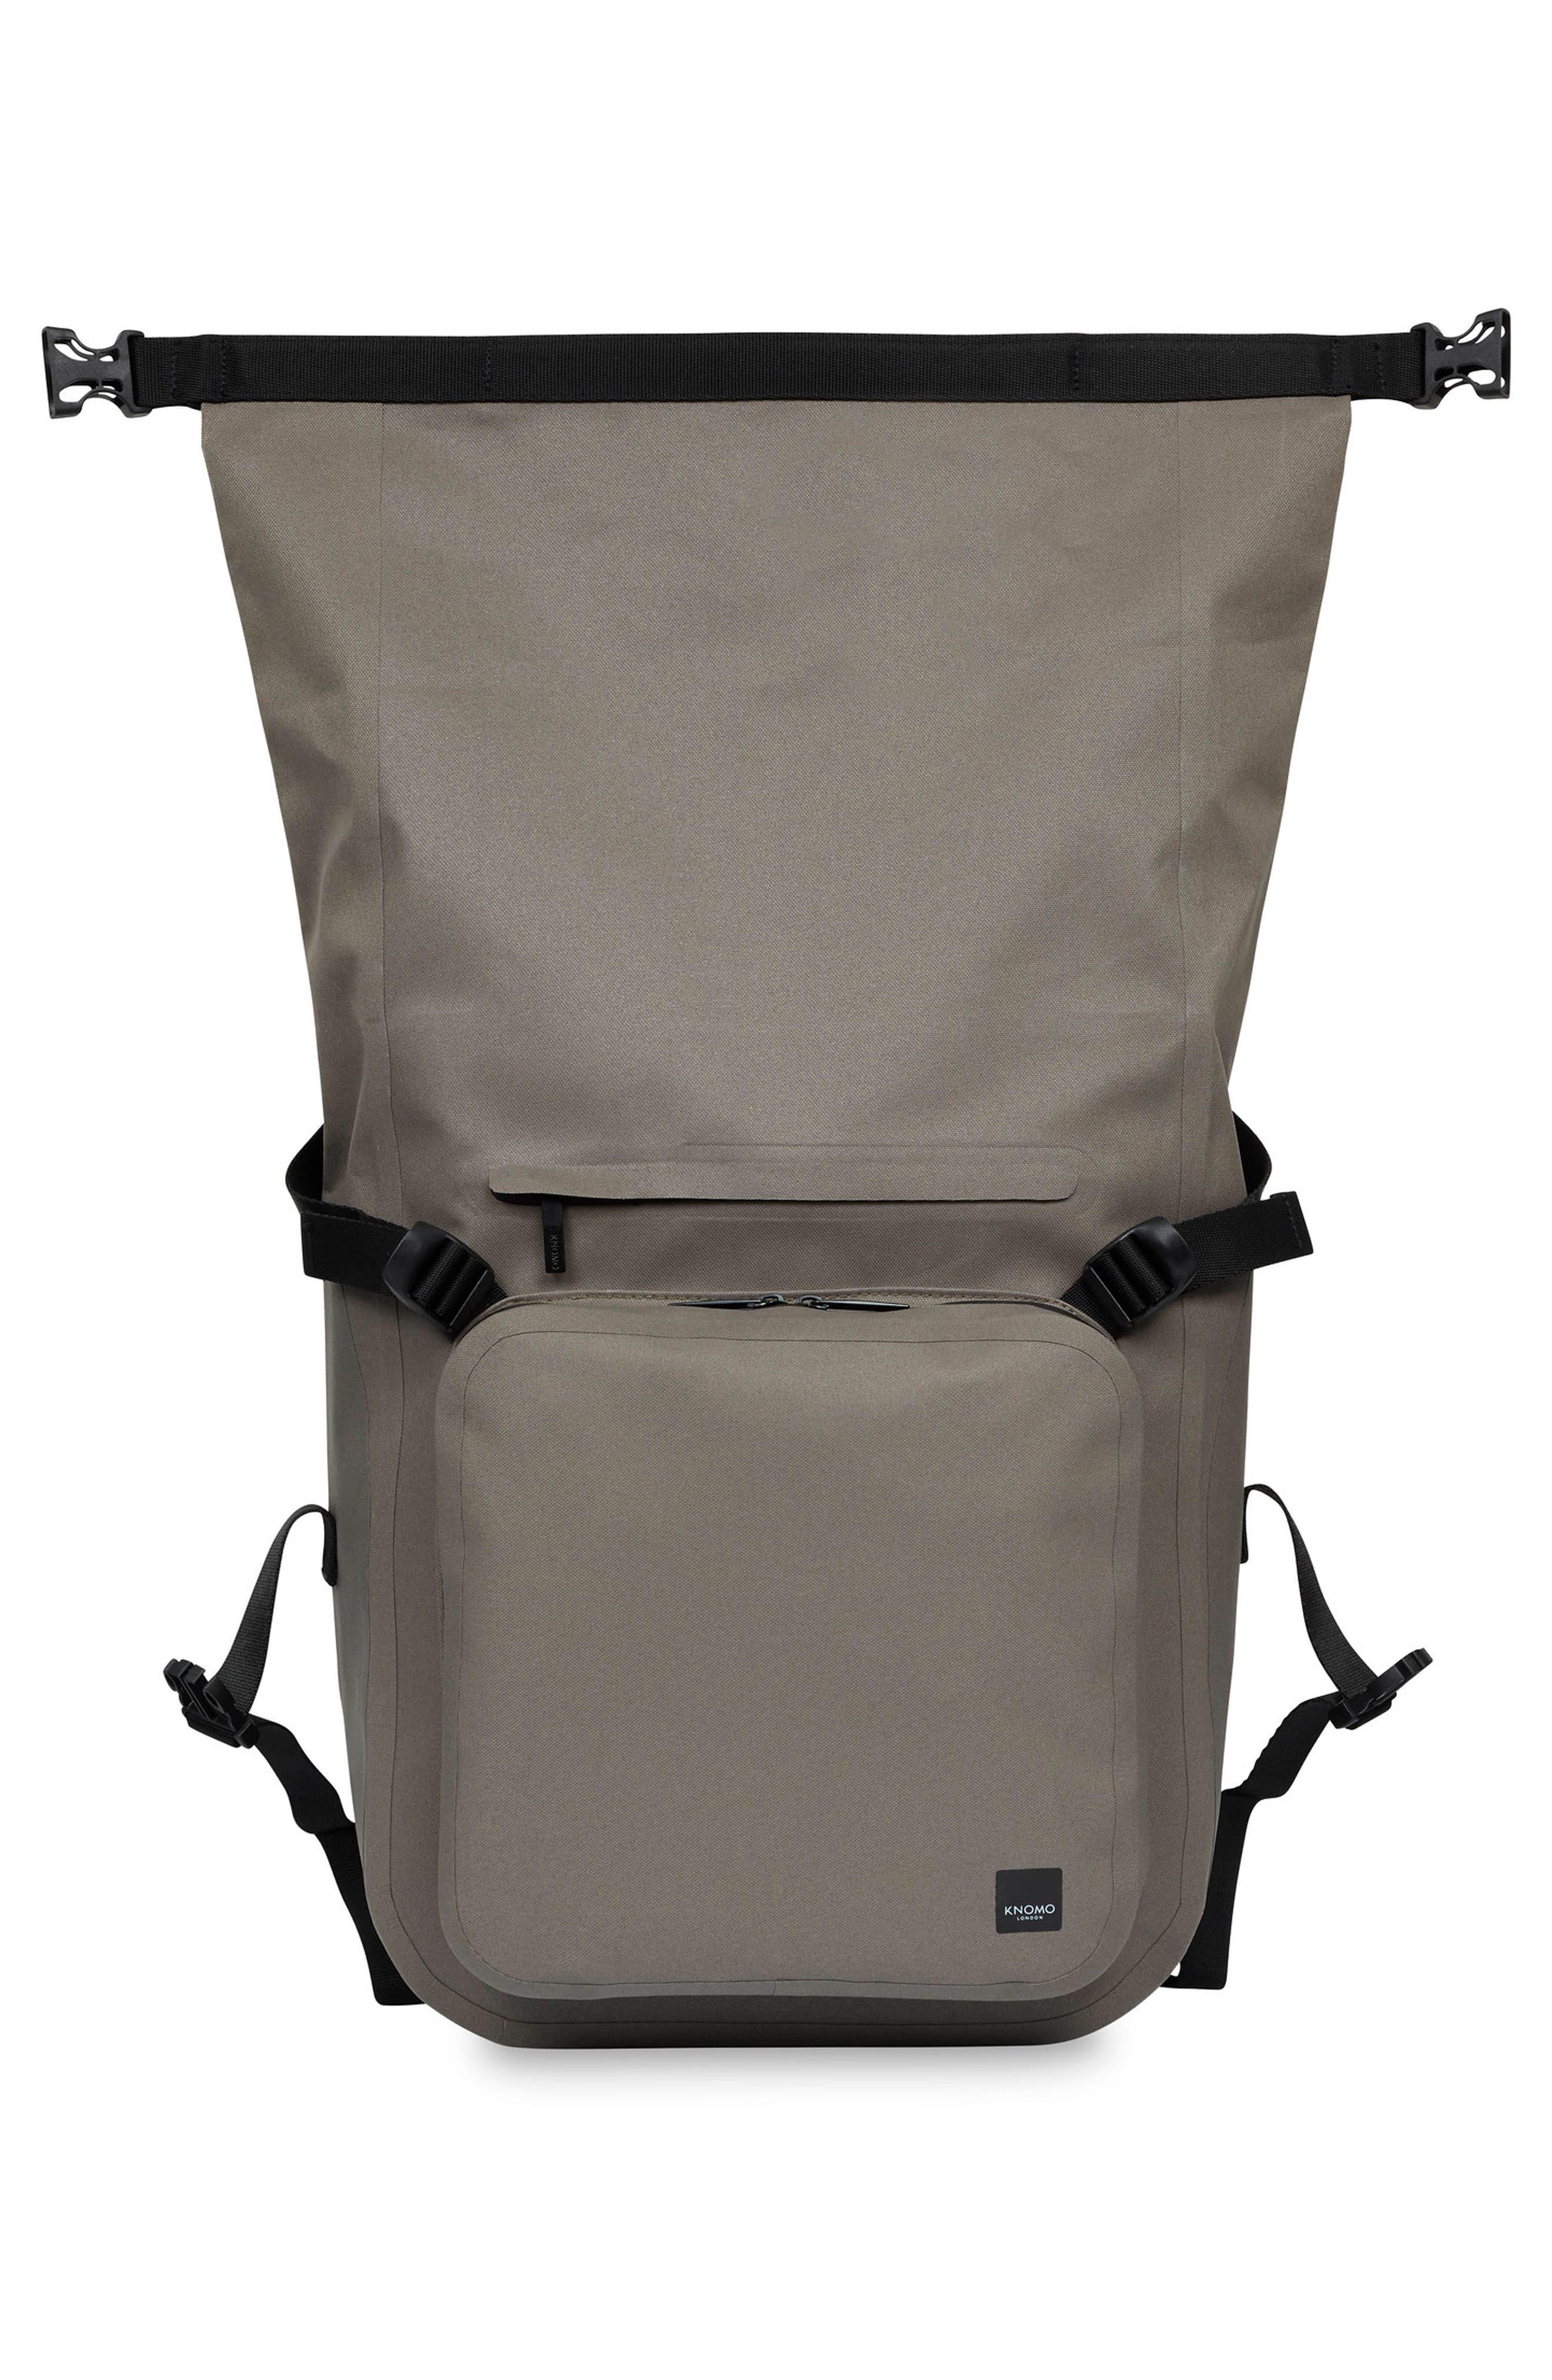 Thames Backpack,                             Alternate thumbnail 6, color,                             KHAKI